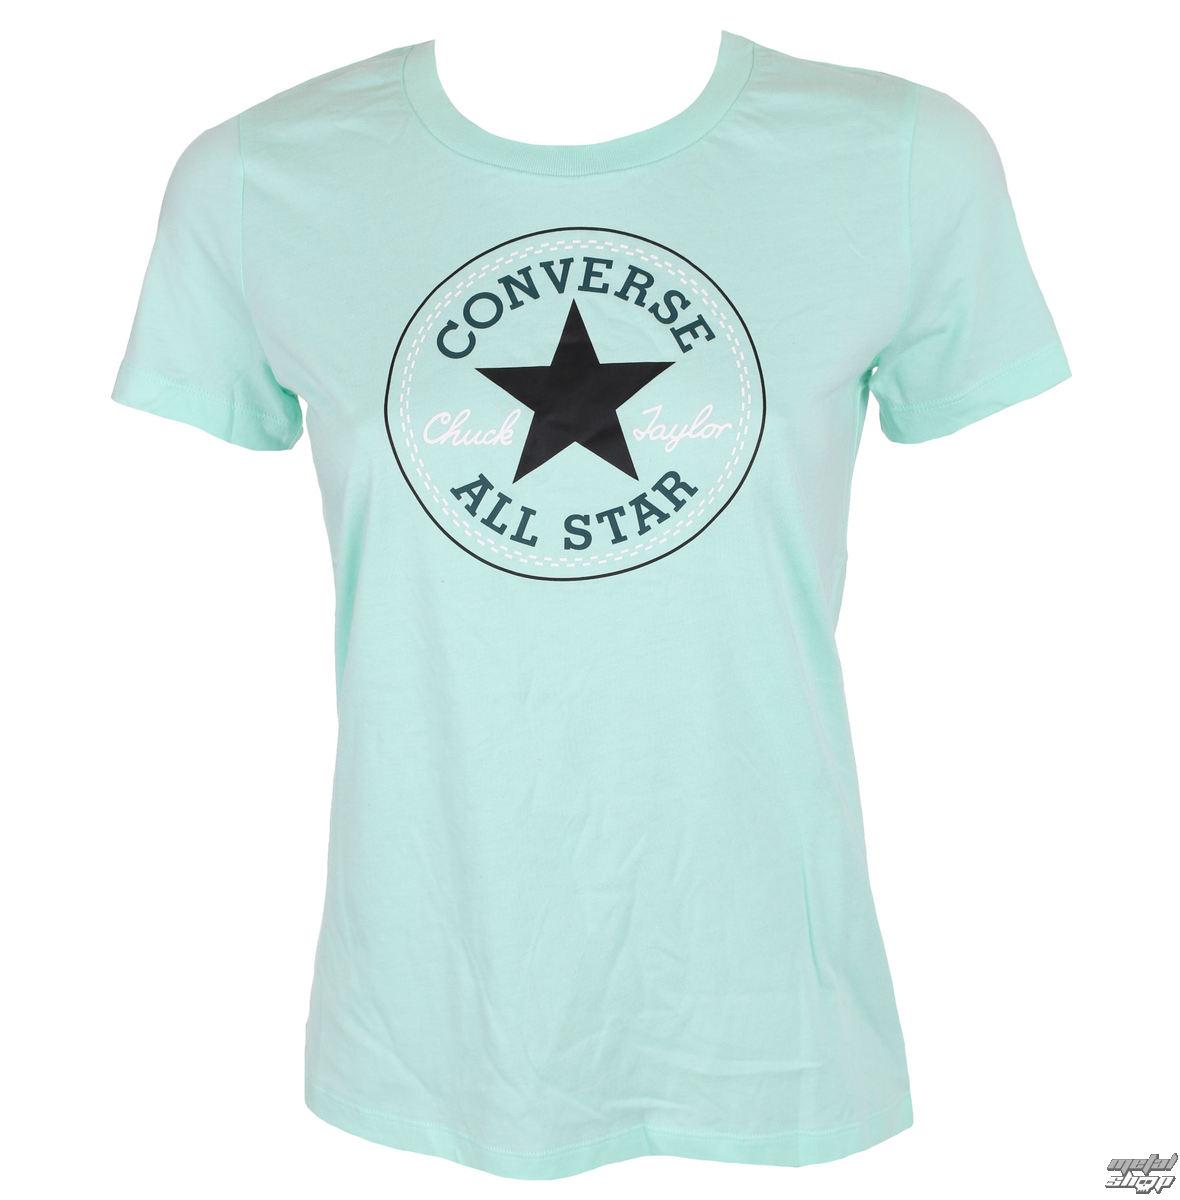 2a0d67e1ae50 t-shirt street women s - CORE SOLID CHUCK PATCH - CONVERSE - 10001124-A16 -  metal-shop.eu